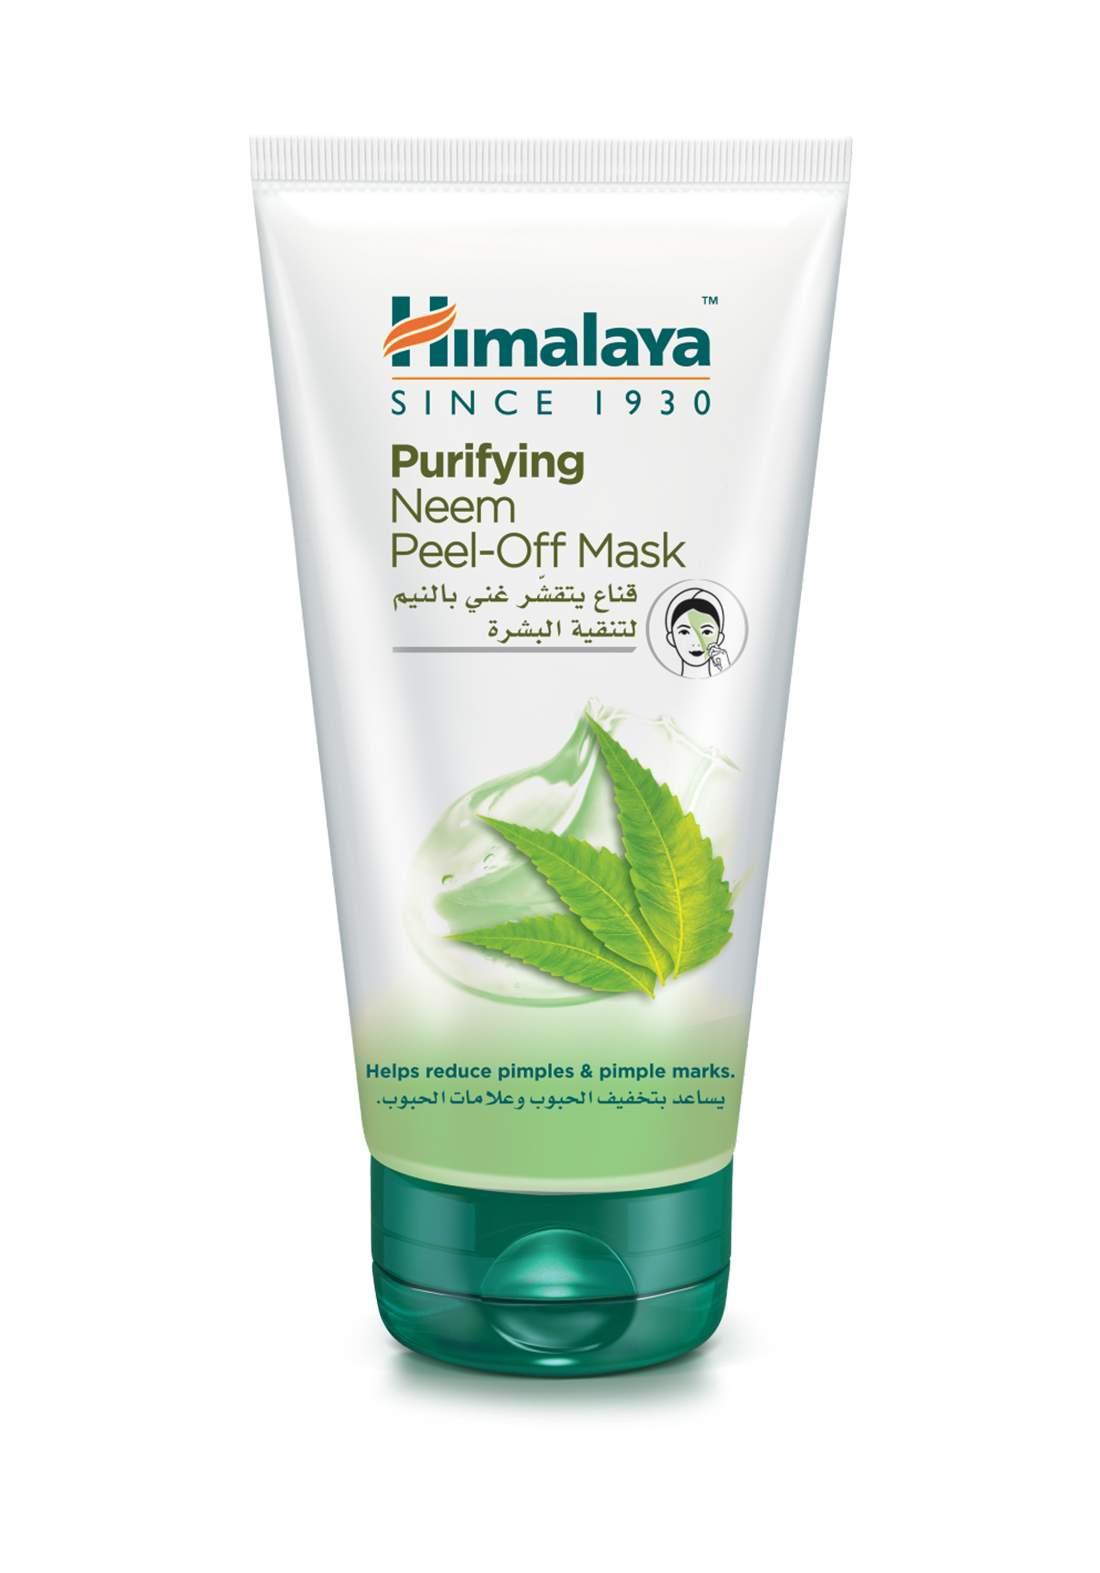 Face Mask 150ml - Purifying Neem Peel-Off Mask هيمالايا قناع يتقشر غني بالنيم لتنقية البشر